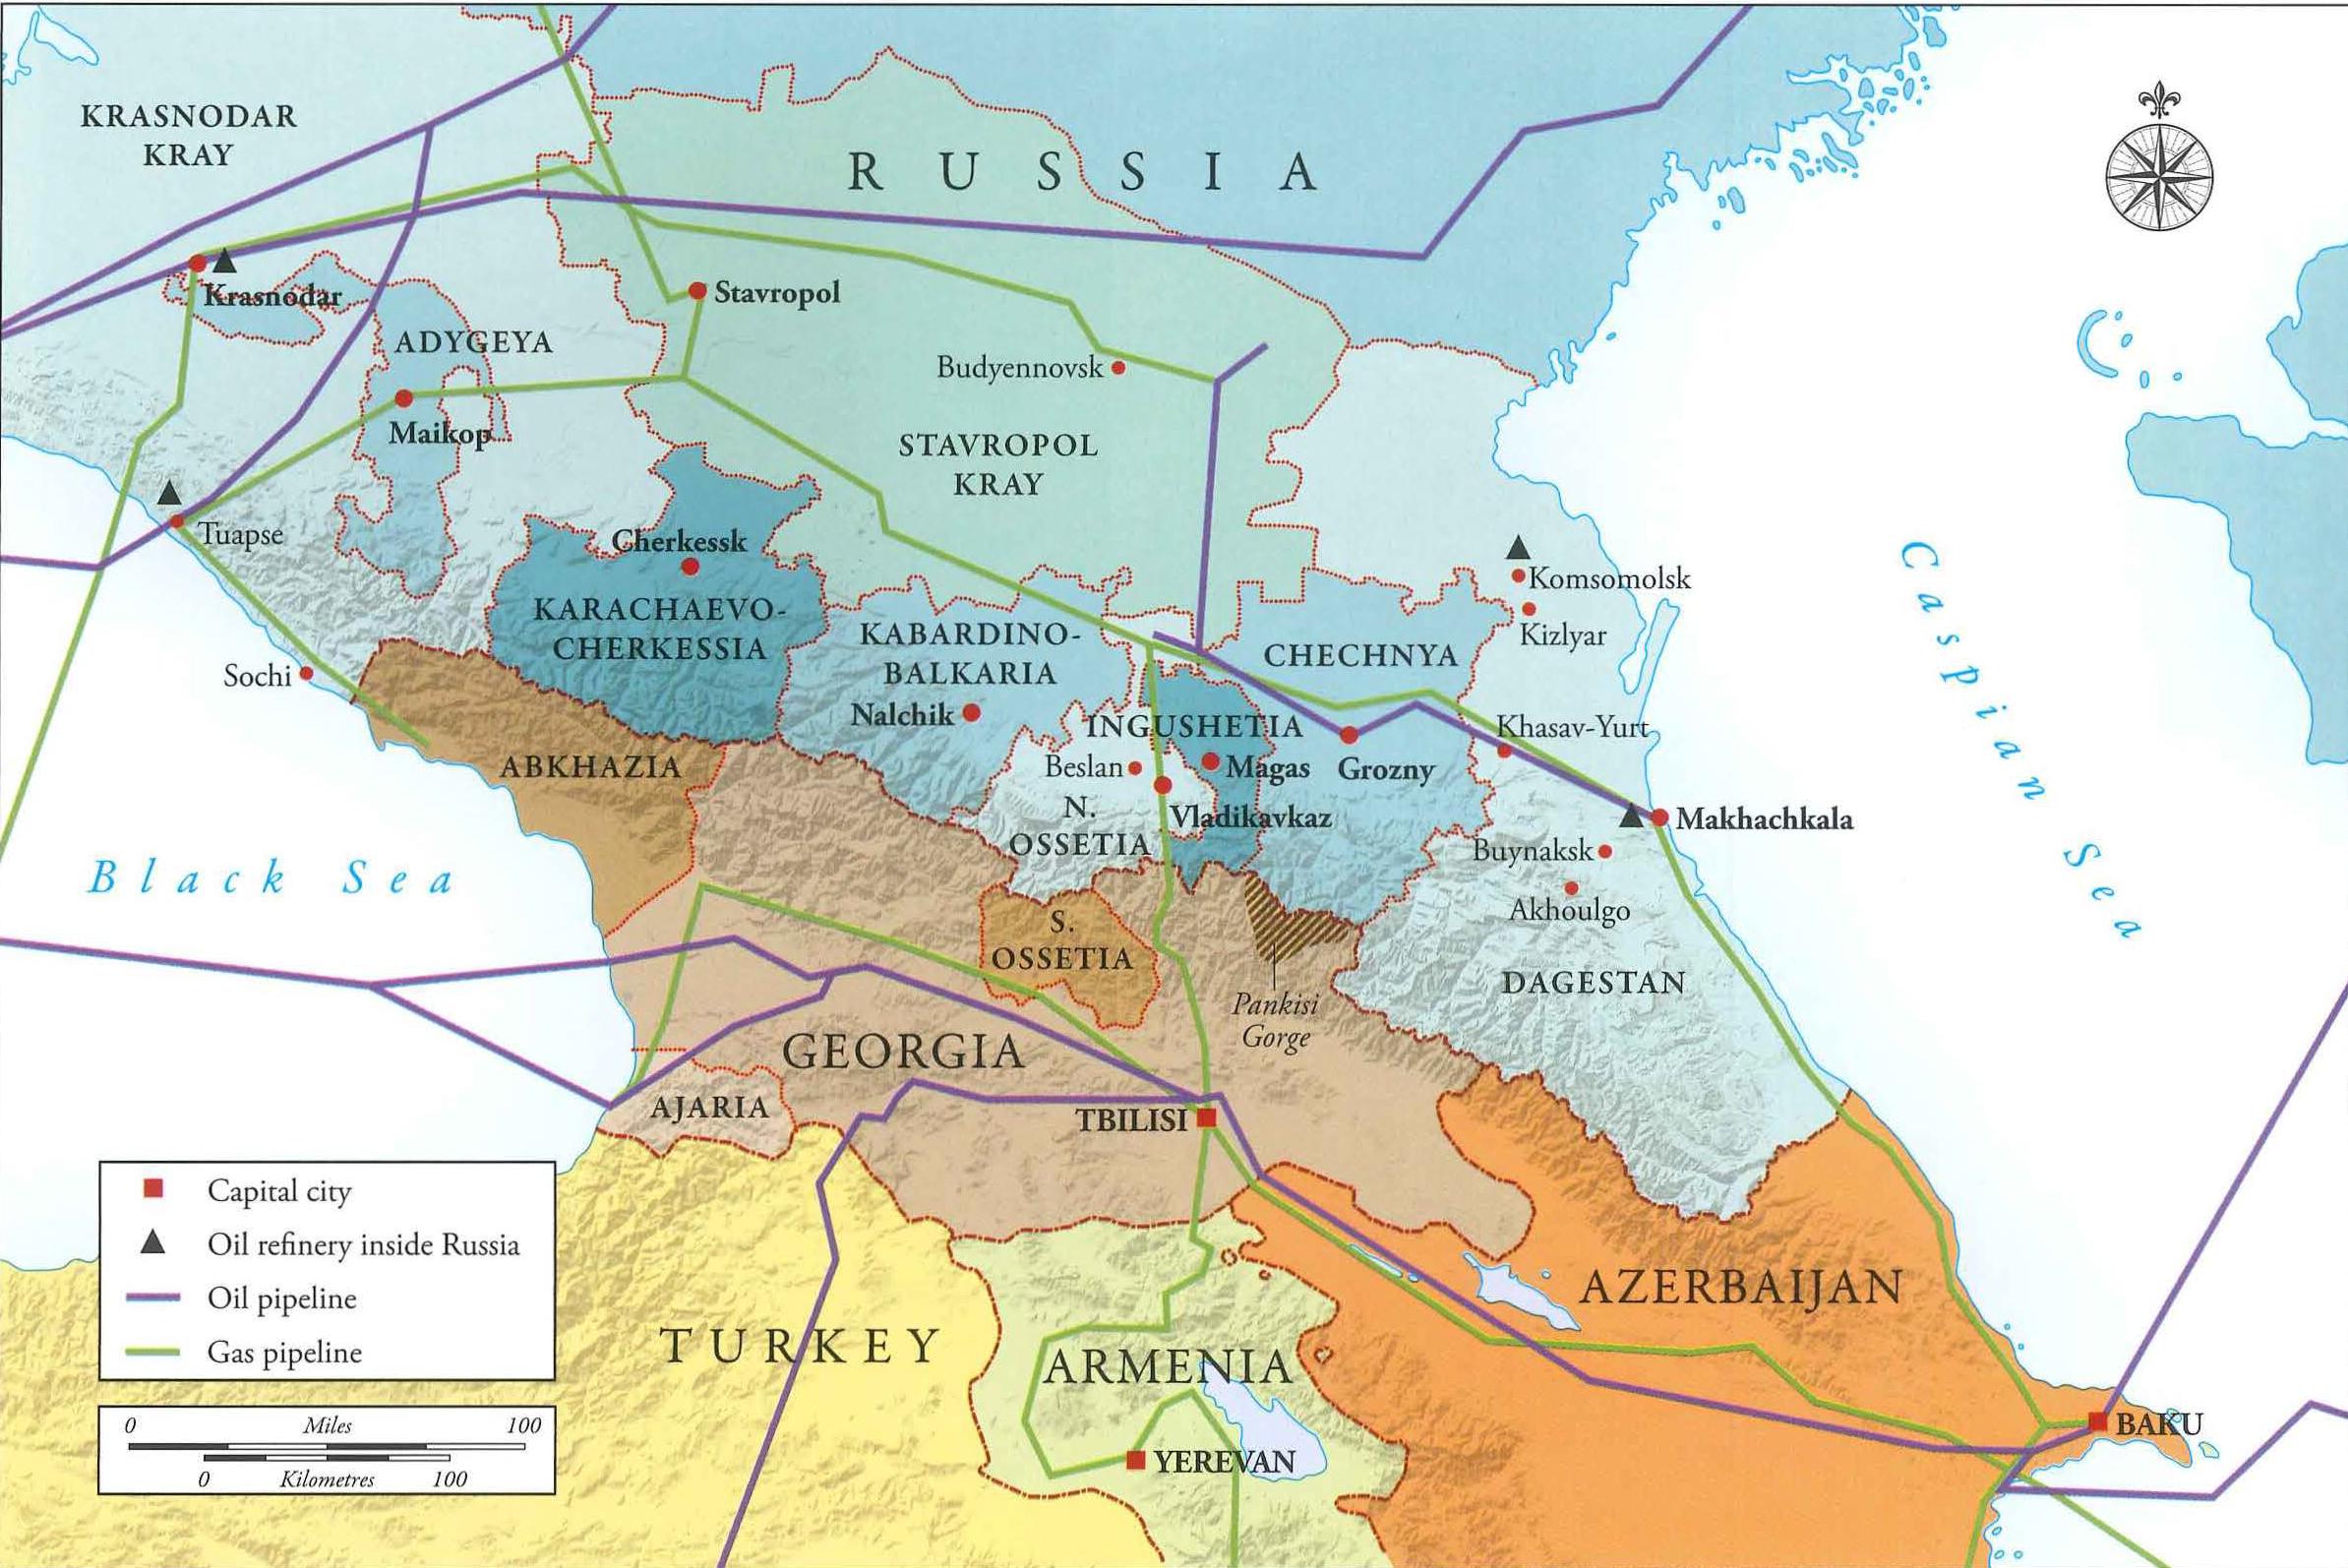 Chechnya Map Galeotti Eurasian Geopolitics - Nalchik map